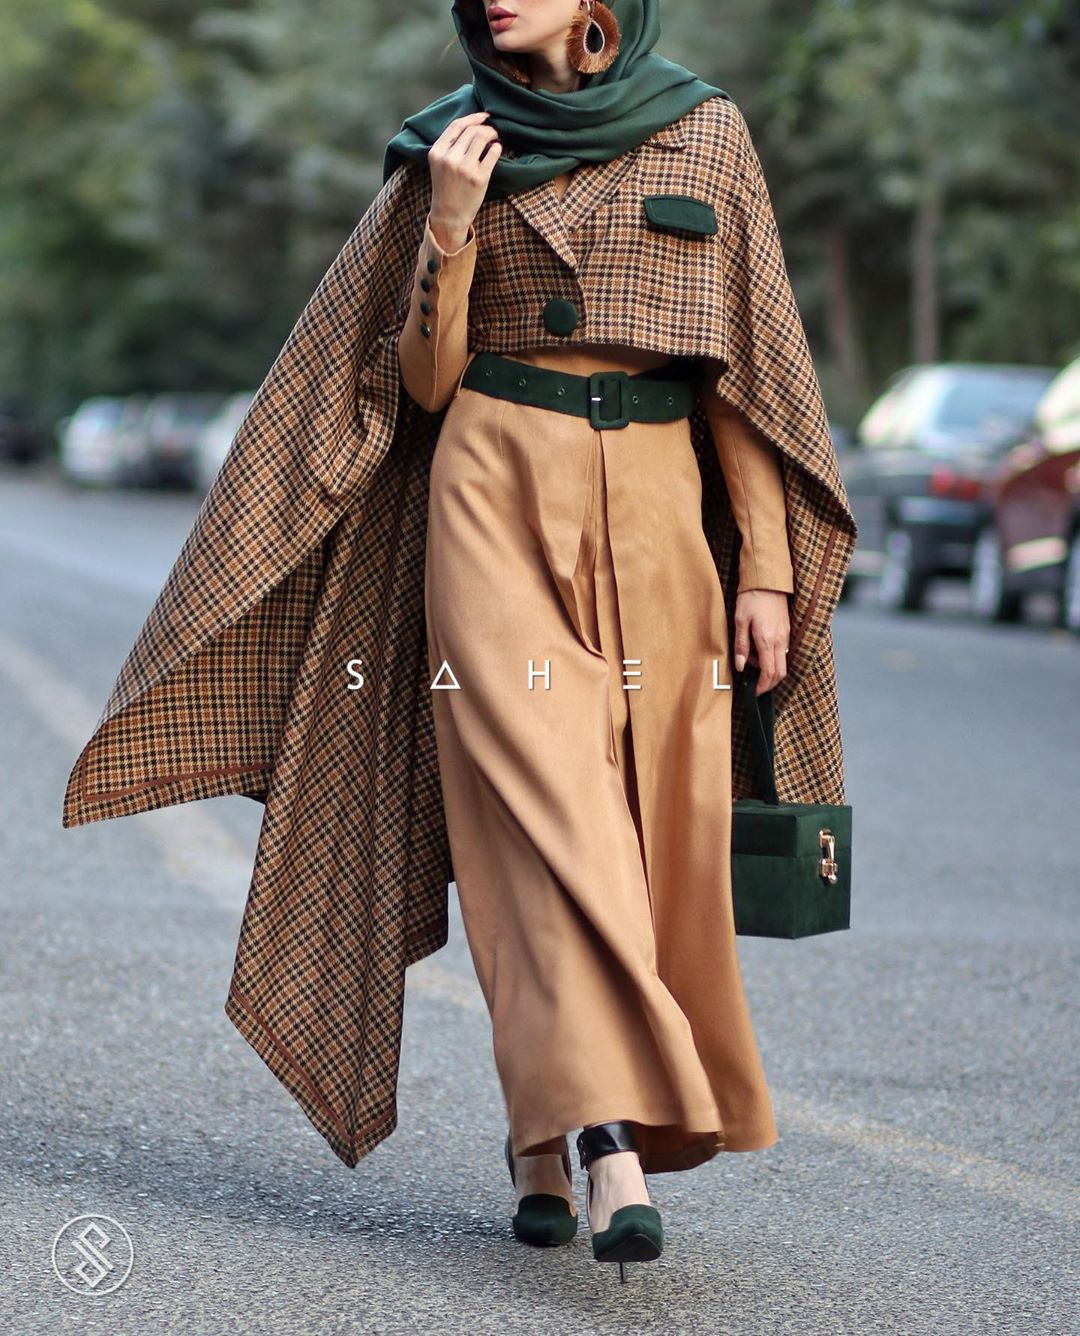 مدل مانتو لاکچری دخترانه